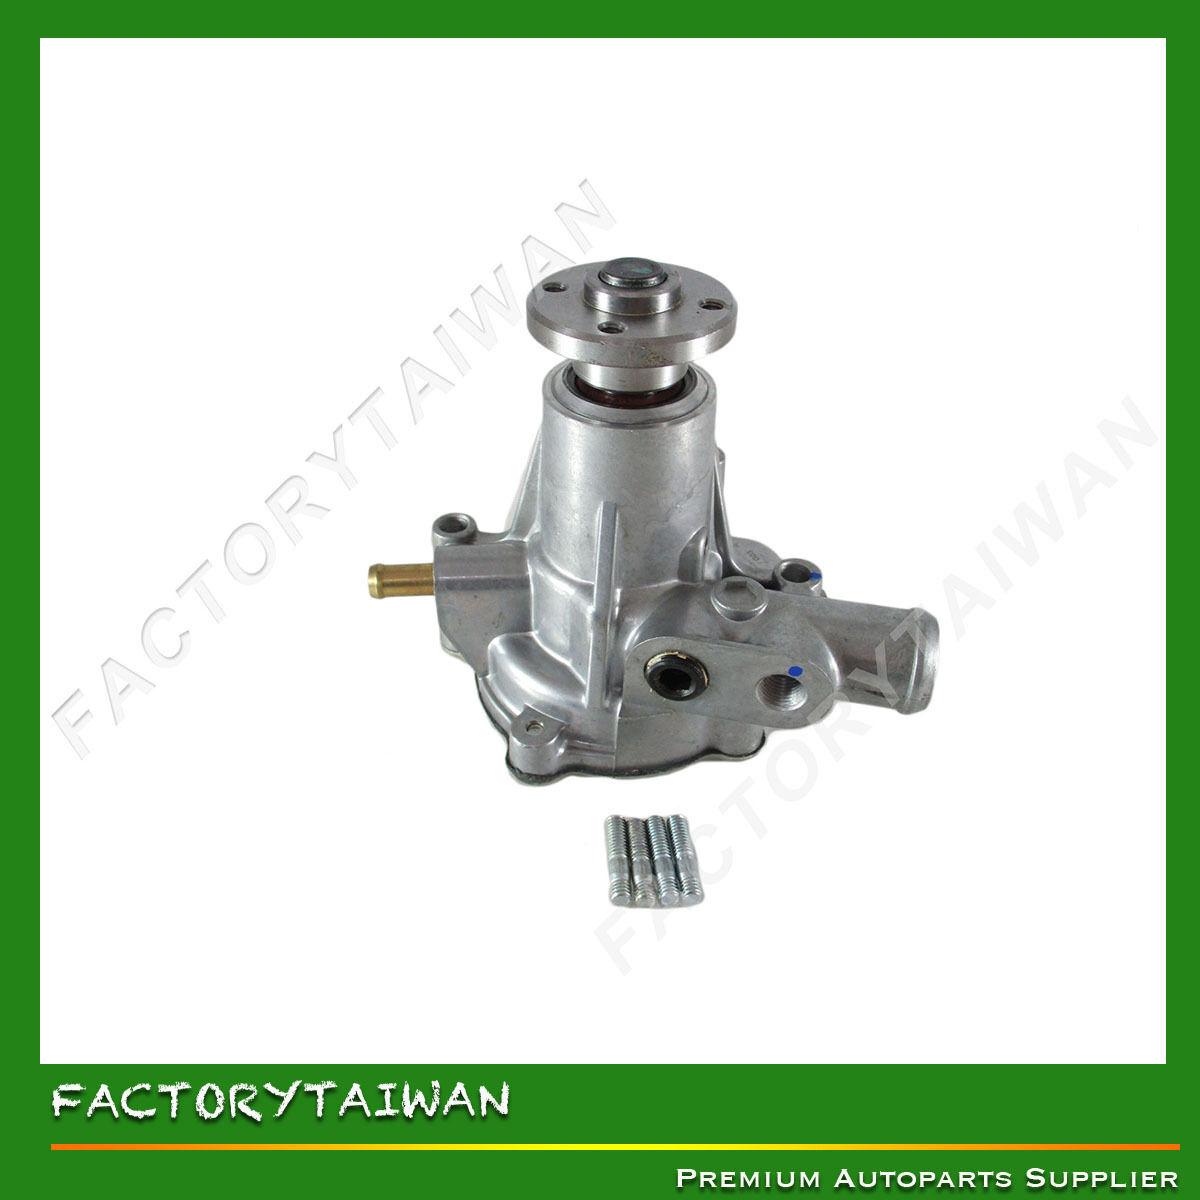 Water Pump 129002-42004 for Yanmar 4TNE84 4TNE88 4TNE84T 4TN84L